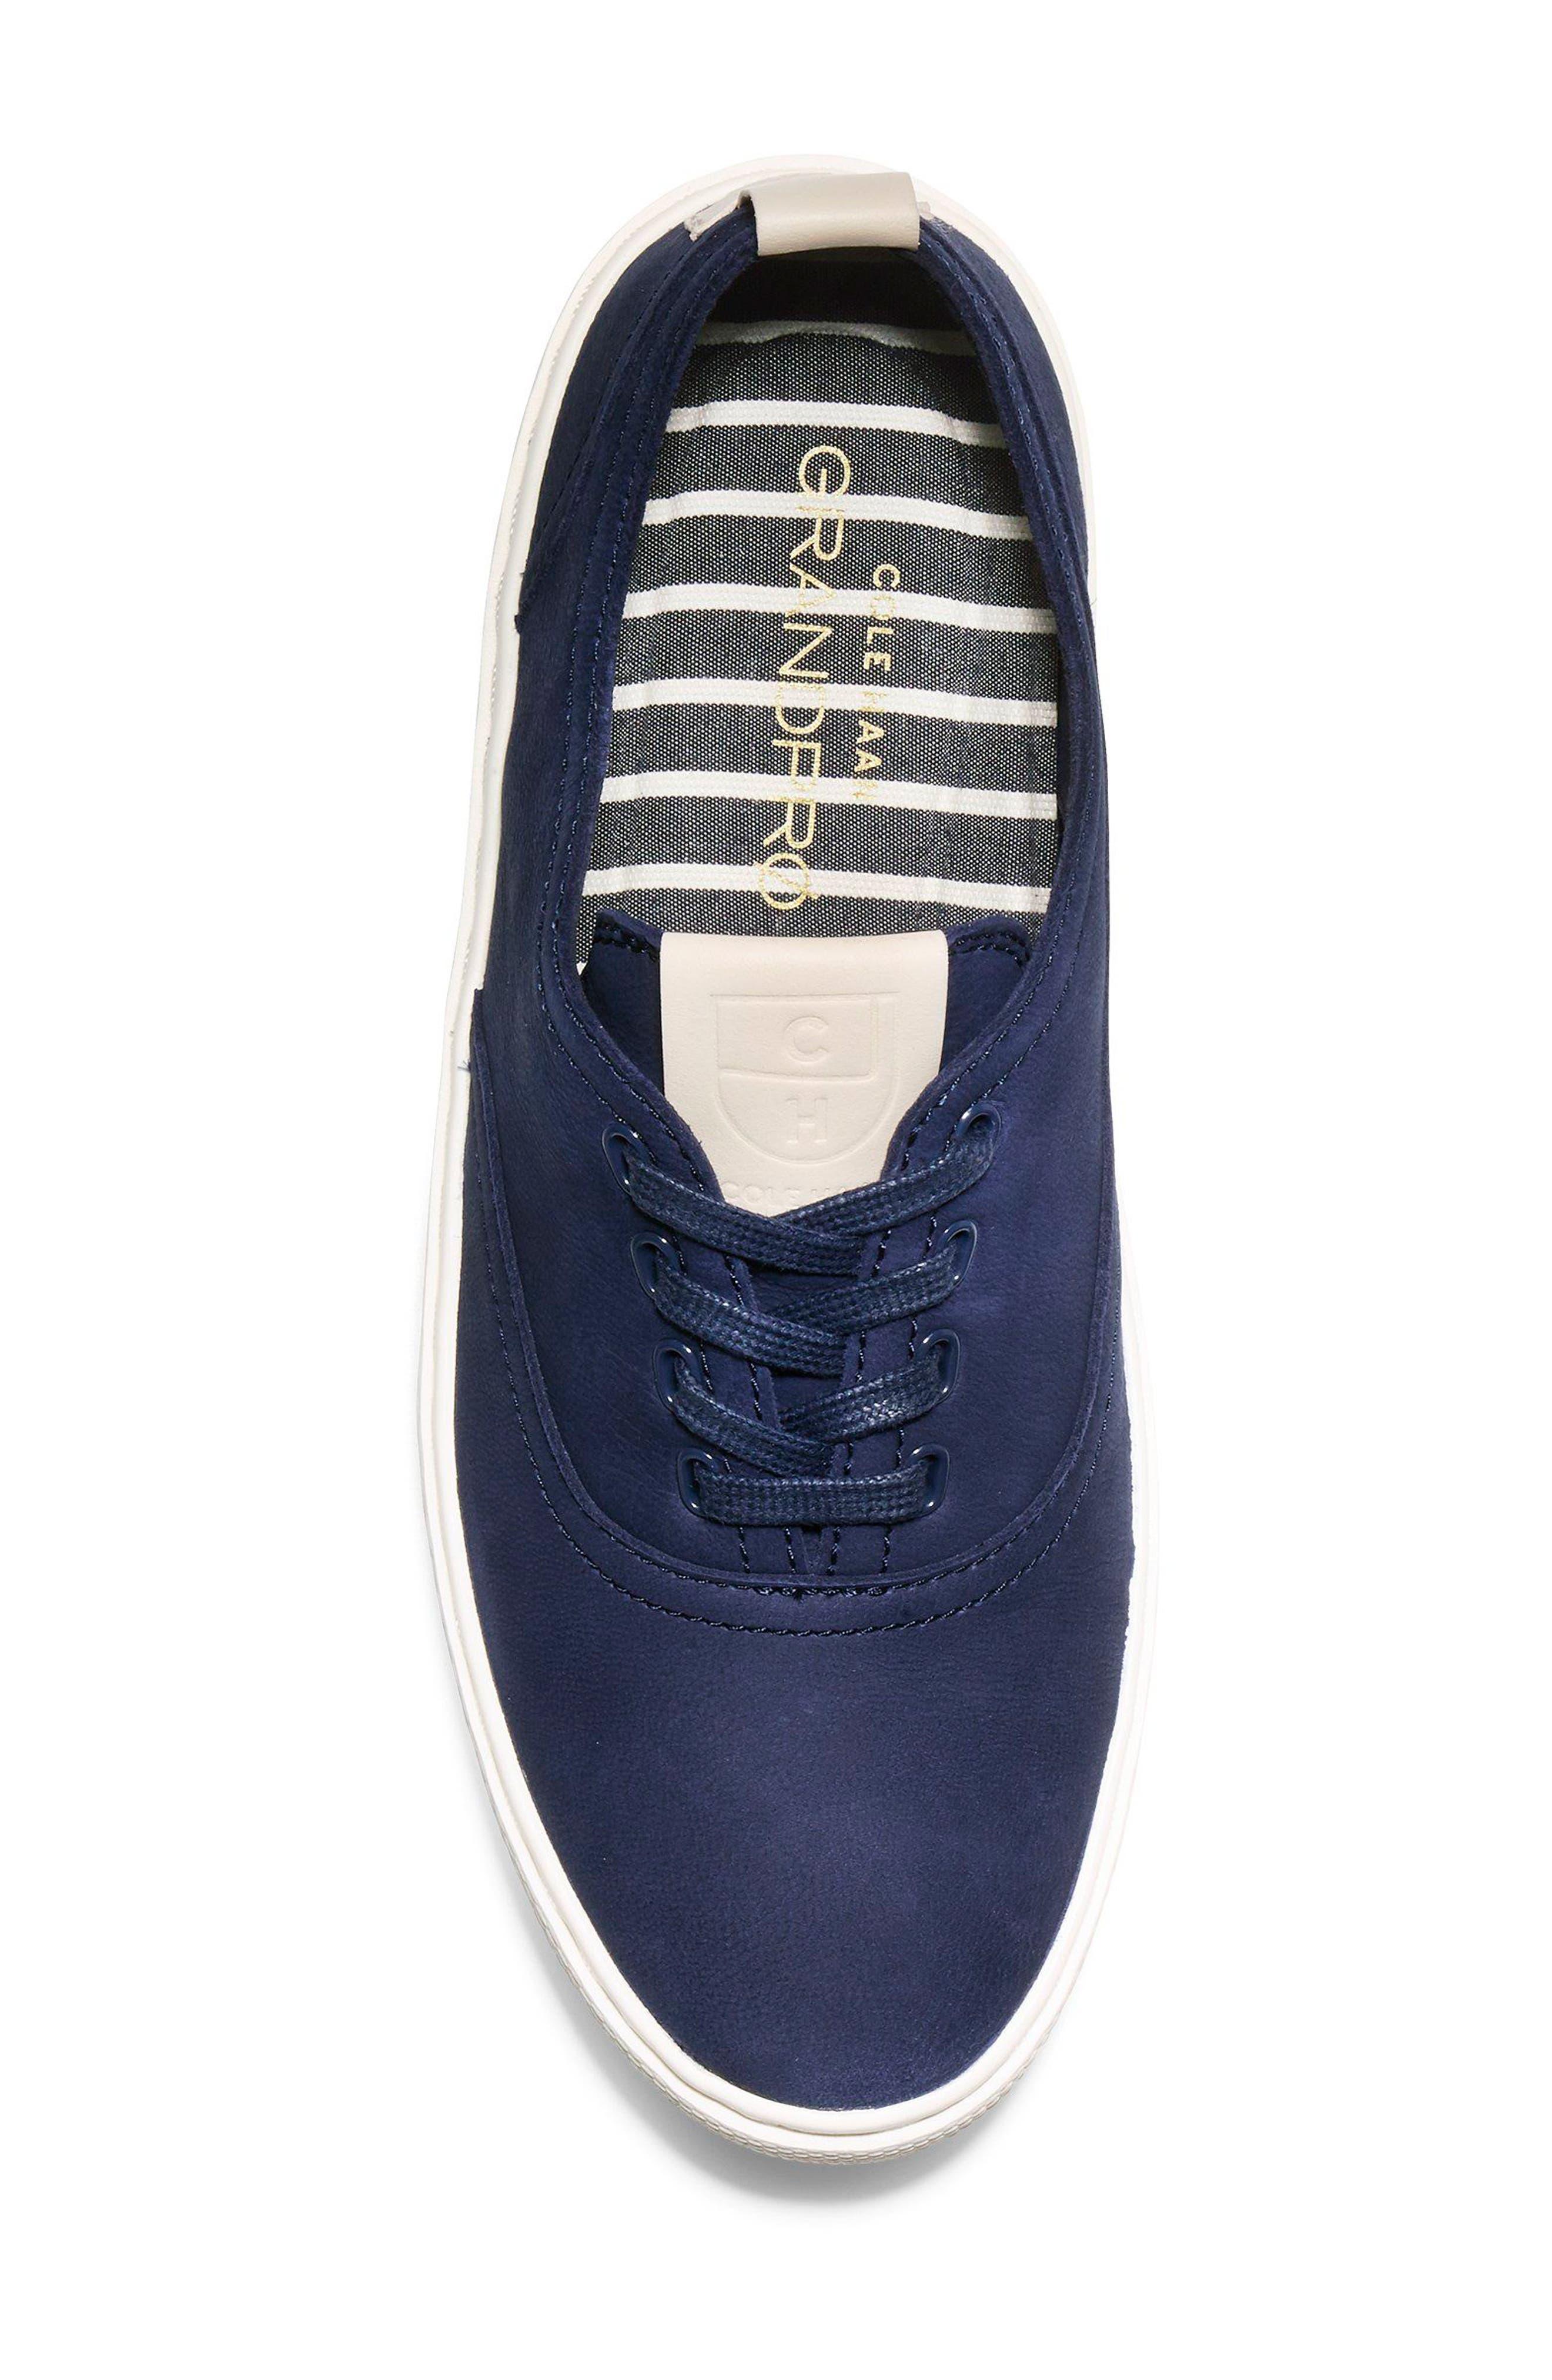 GrandPro Deck Sneaker,                             Alternate thumbnail 5, color,                             Blue/ White Nubuck